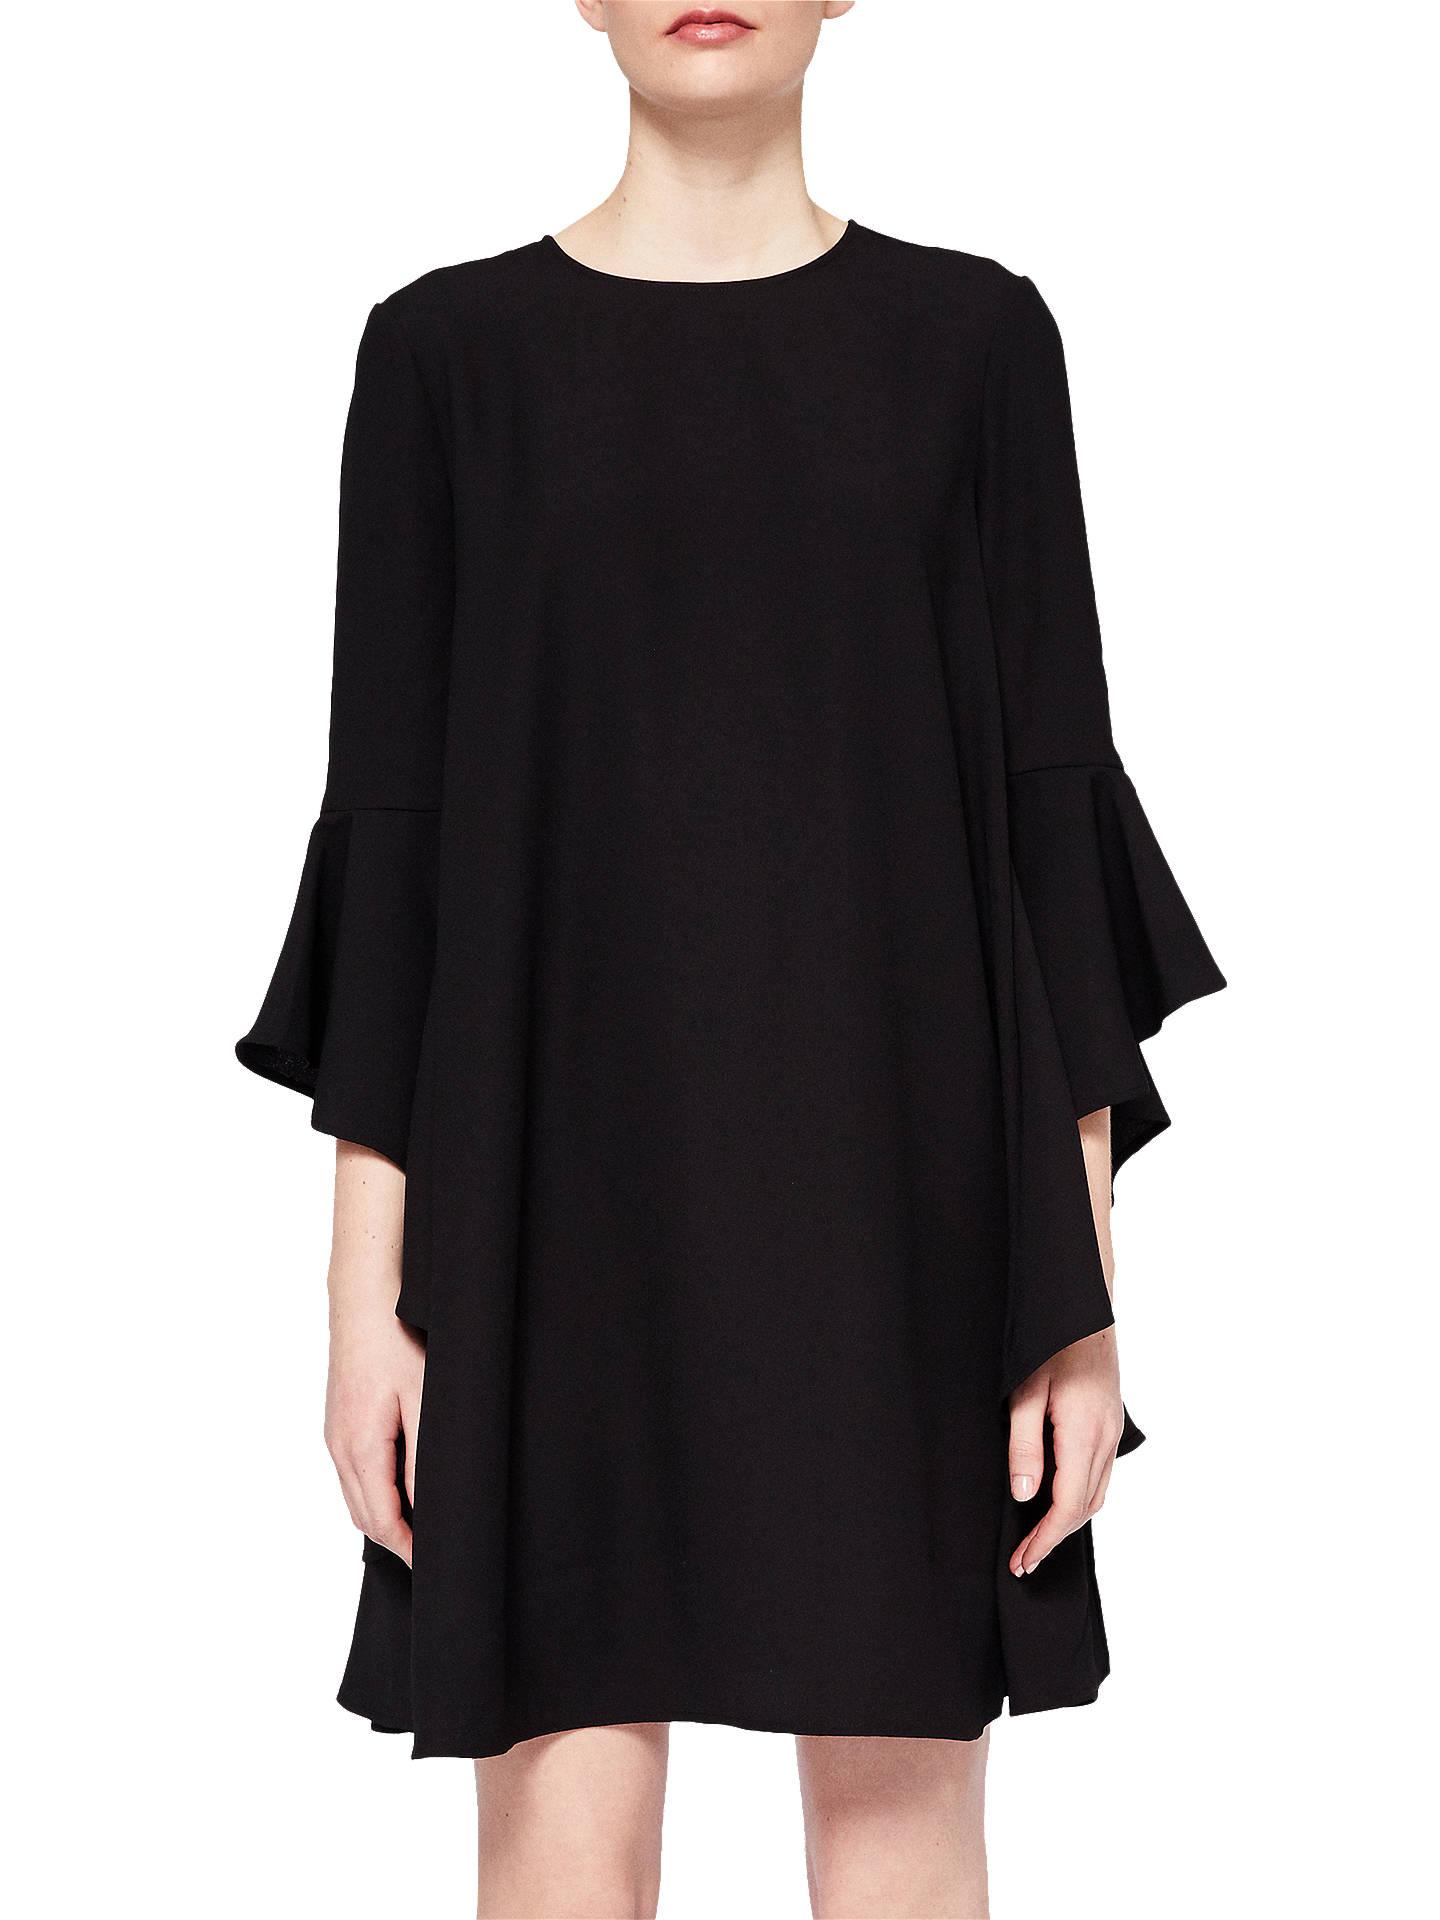 3916d3cf3 Buy Ted Baker Ashleyy A-Line Waterfall Sleeve Dress